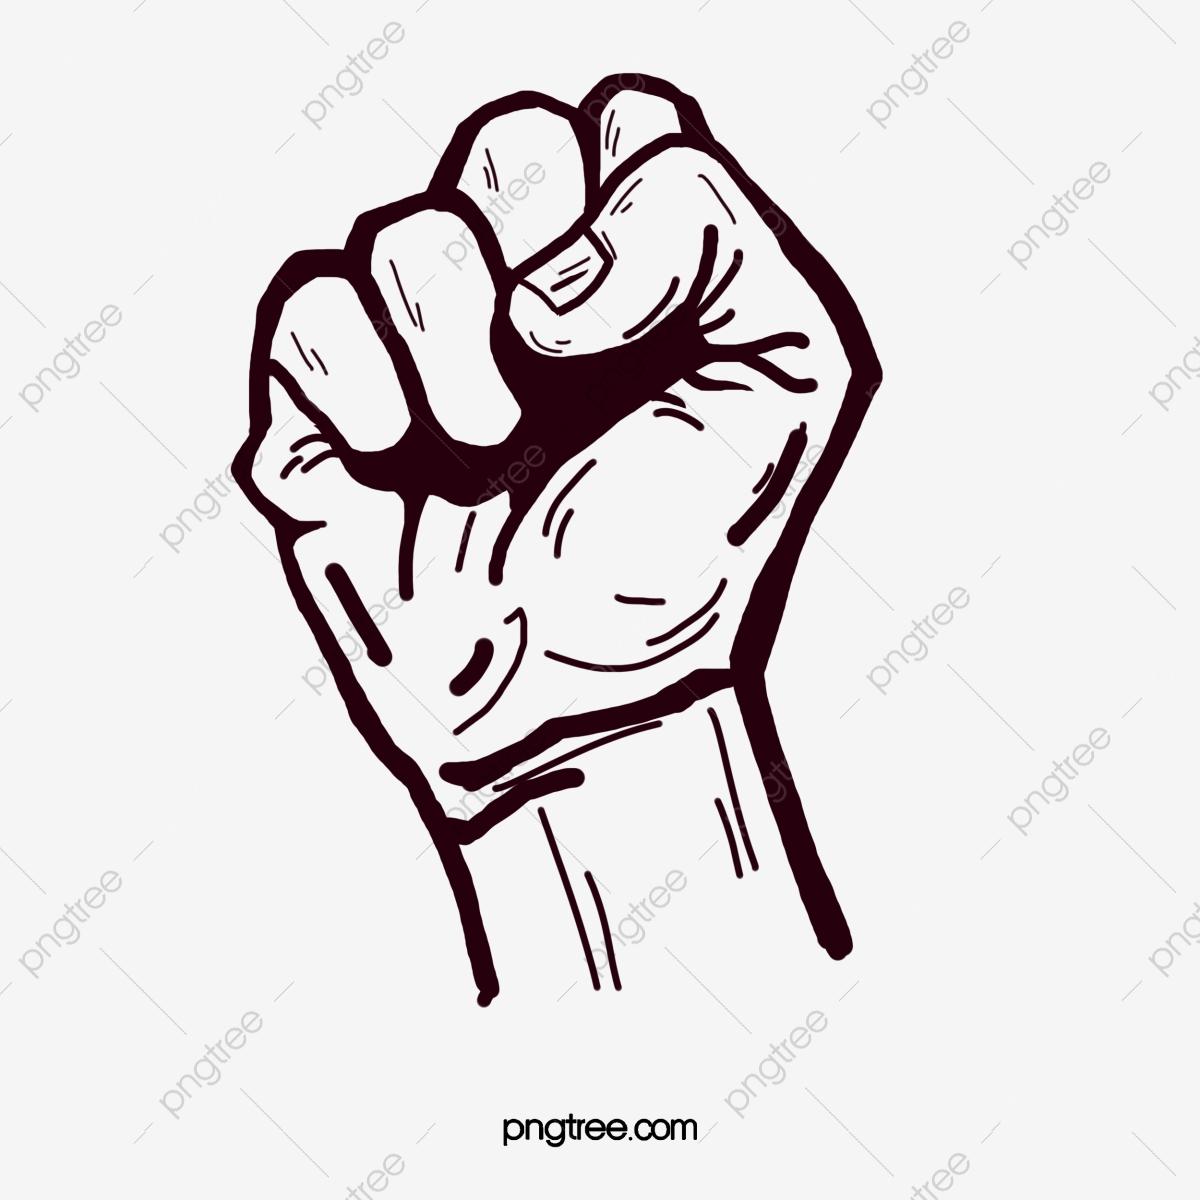 Gesture png transparent . Fist clipart hand fist